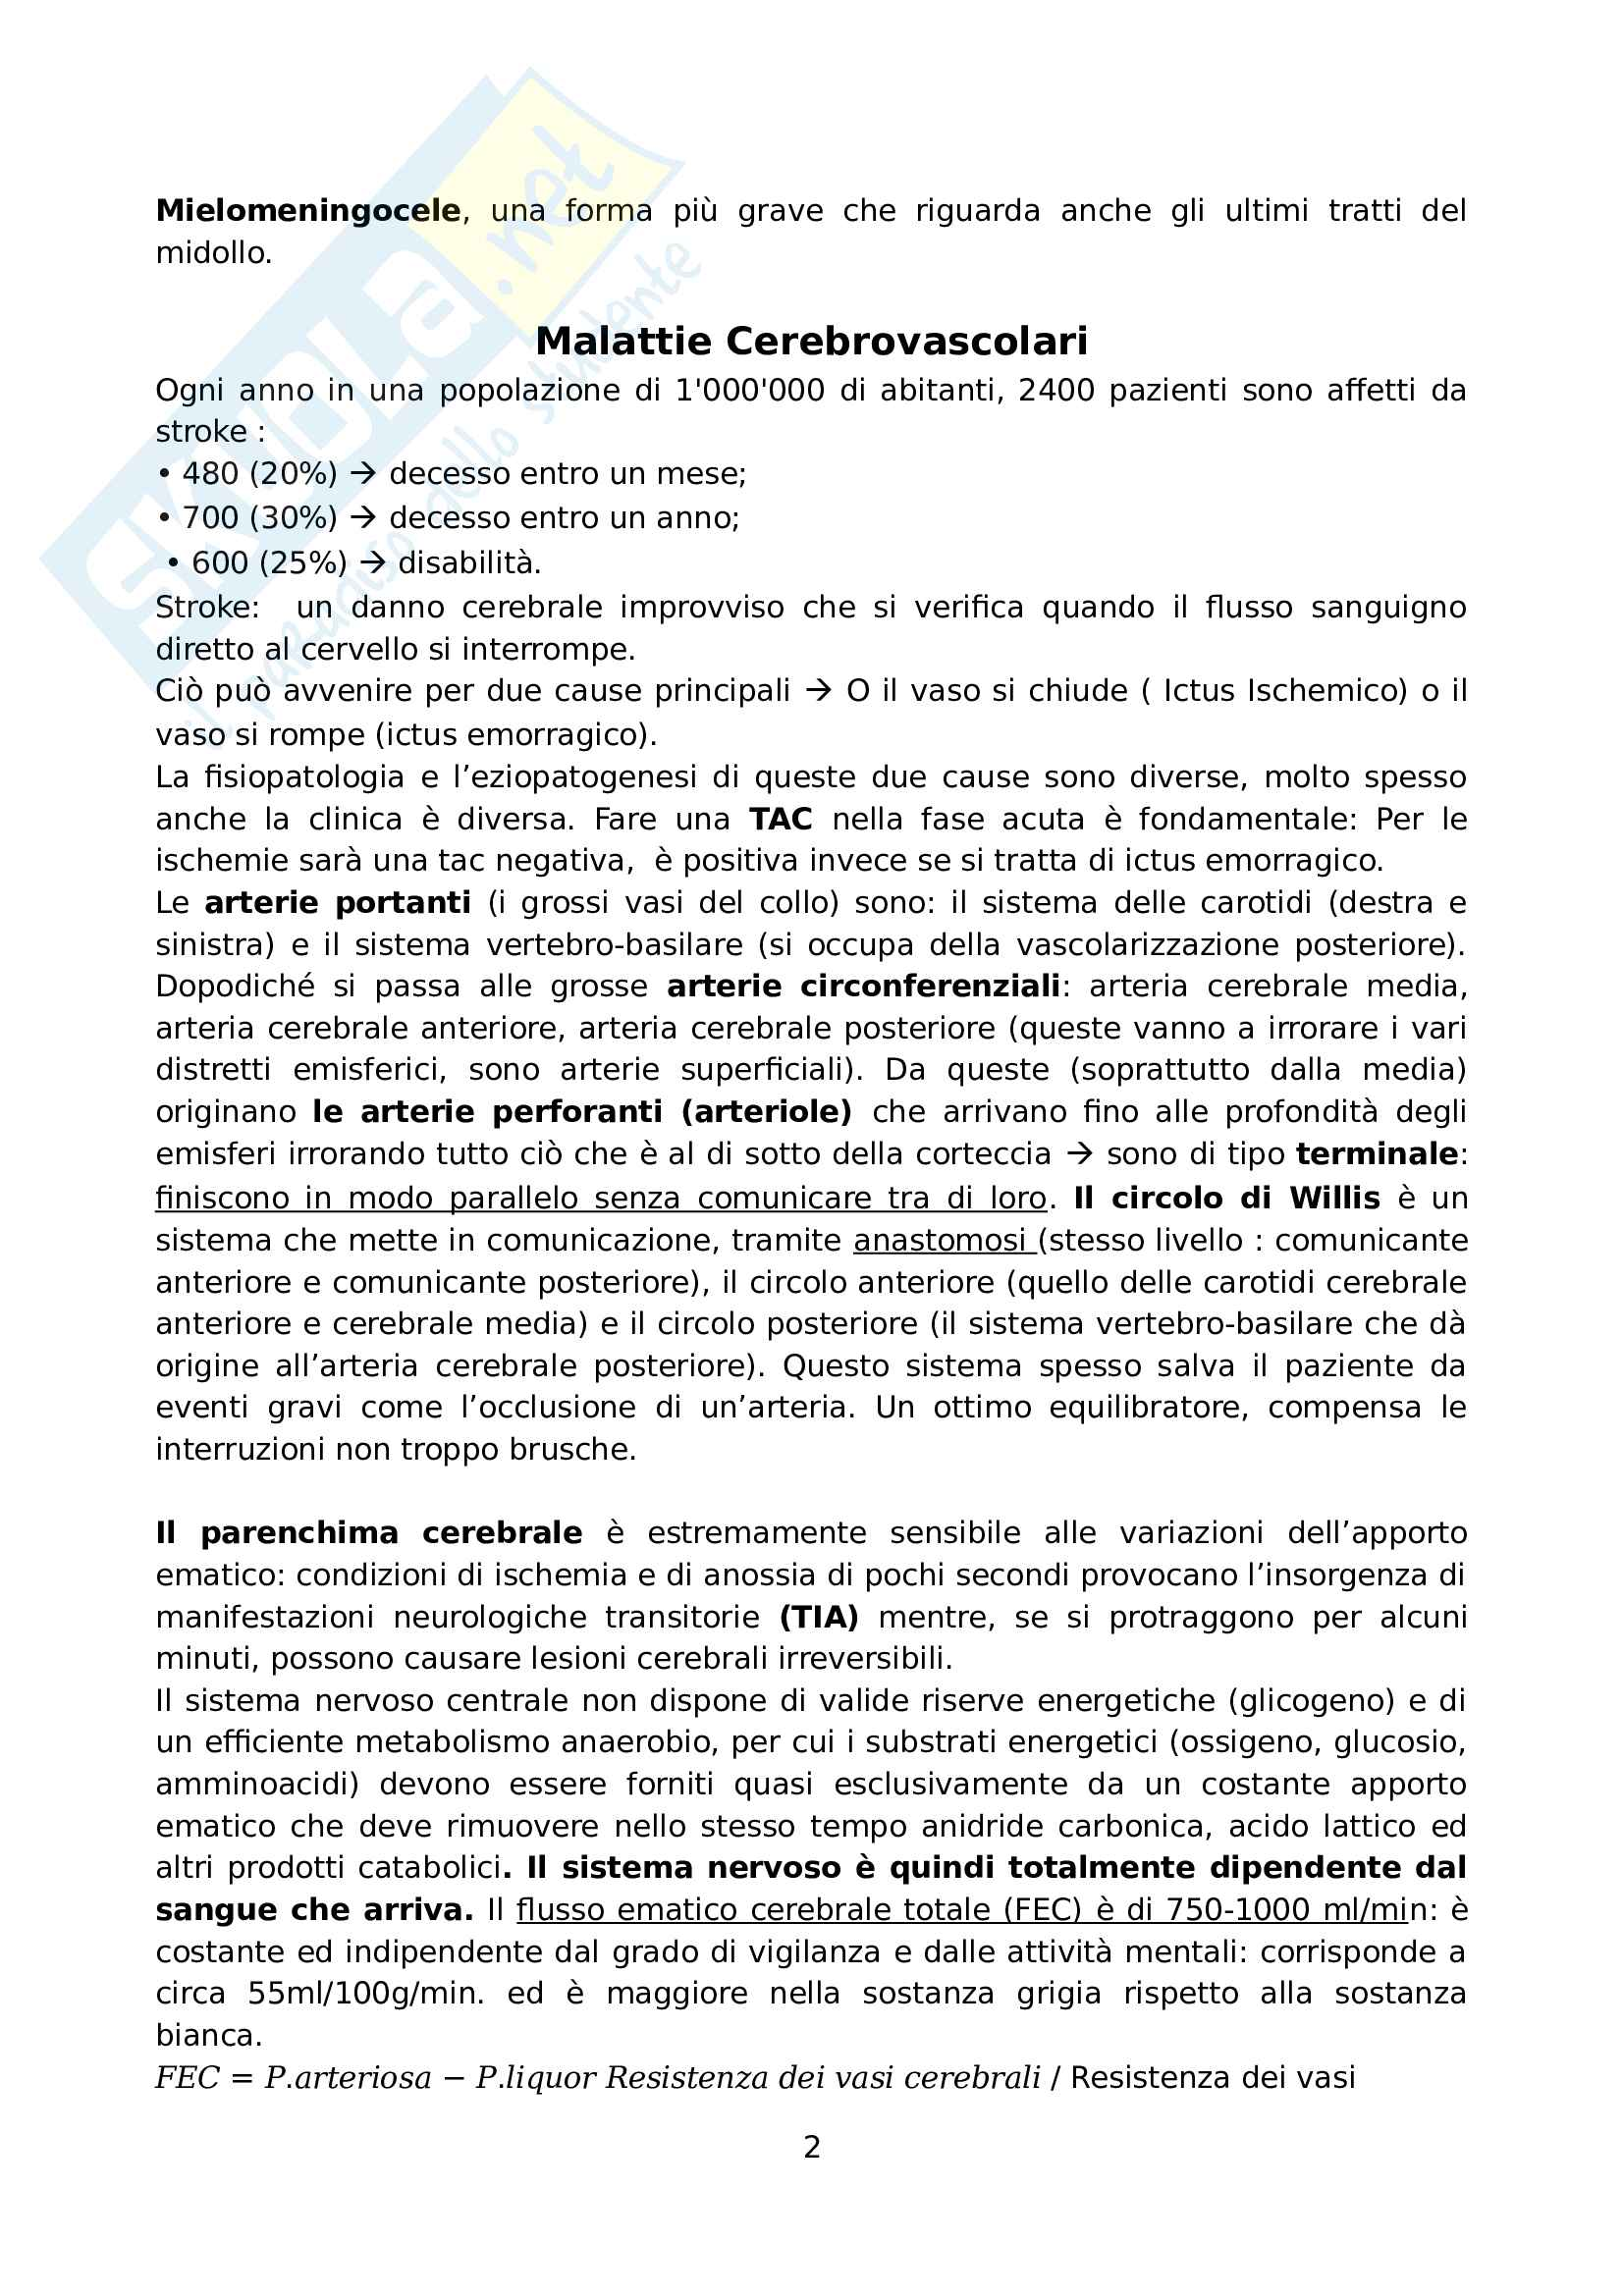 Elementi di Neurologia e Neuroriabilitazione - Riassunto schema Pag. 2